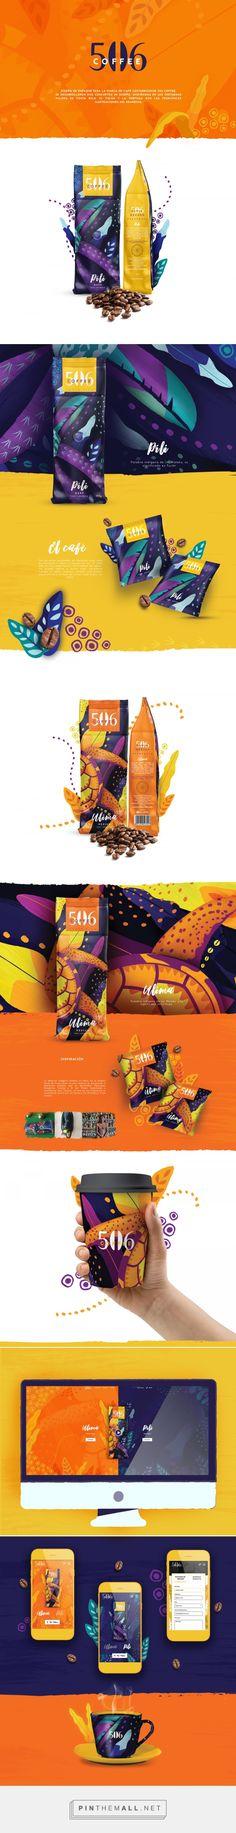 506 Coffee Packaging by Daniela Jiménez | Fivestar Branding Agency – Design and Branding Agency & Curated Inspiration Gallery  #coffee #coffeepackaging #packaging #package #packagedesign #packaginginspiration #design #designinspiration #logo